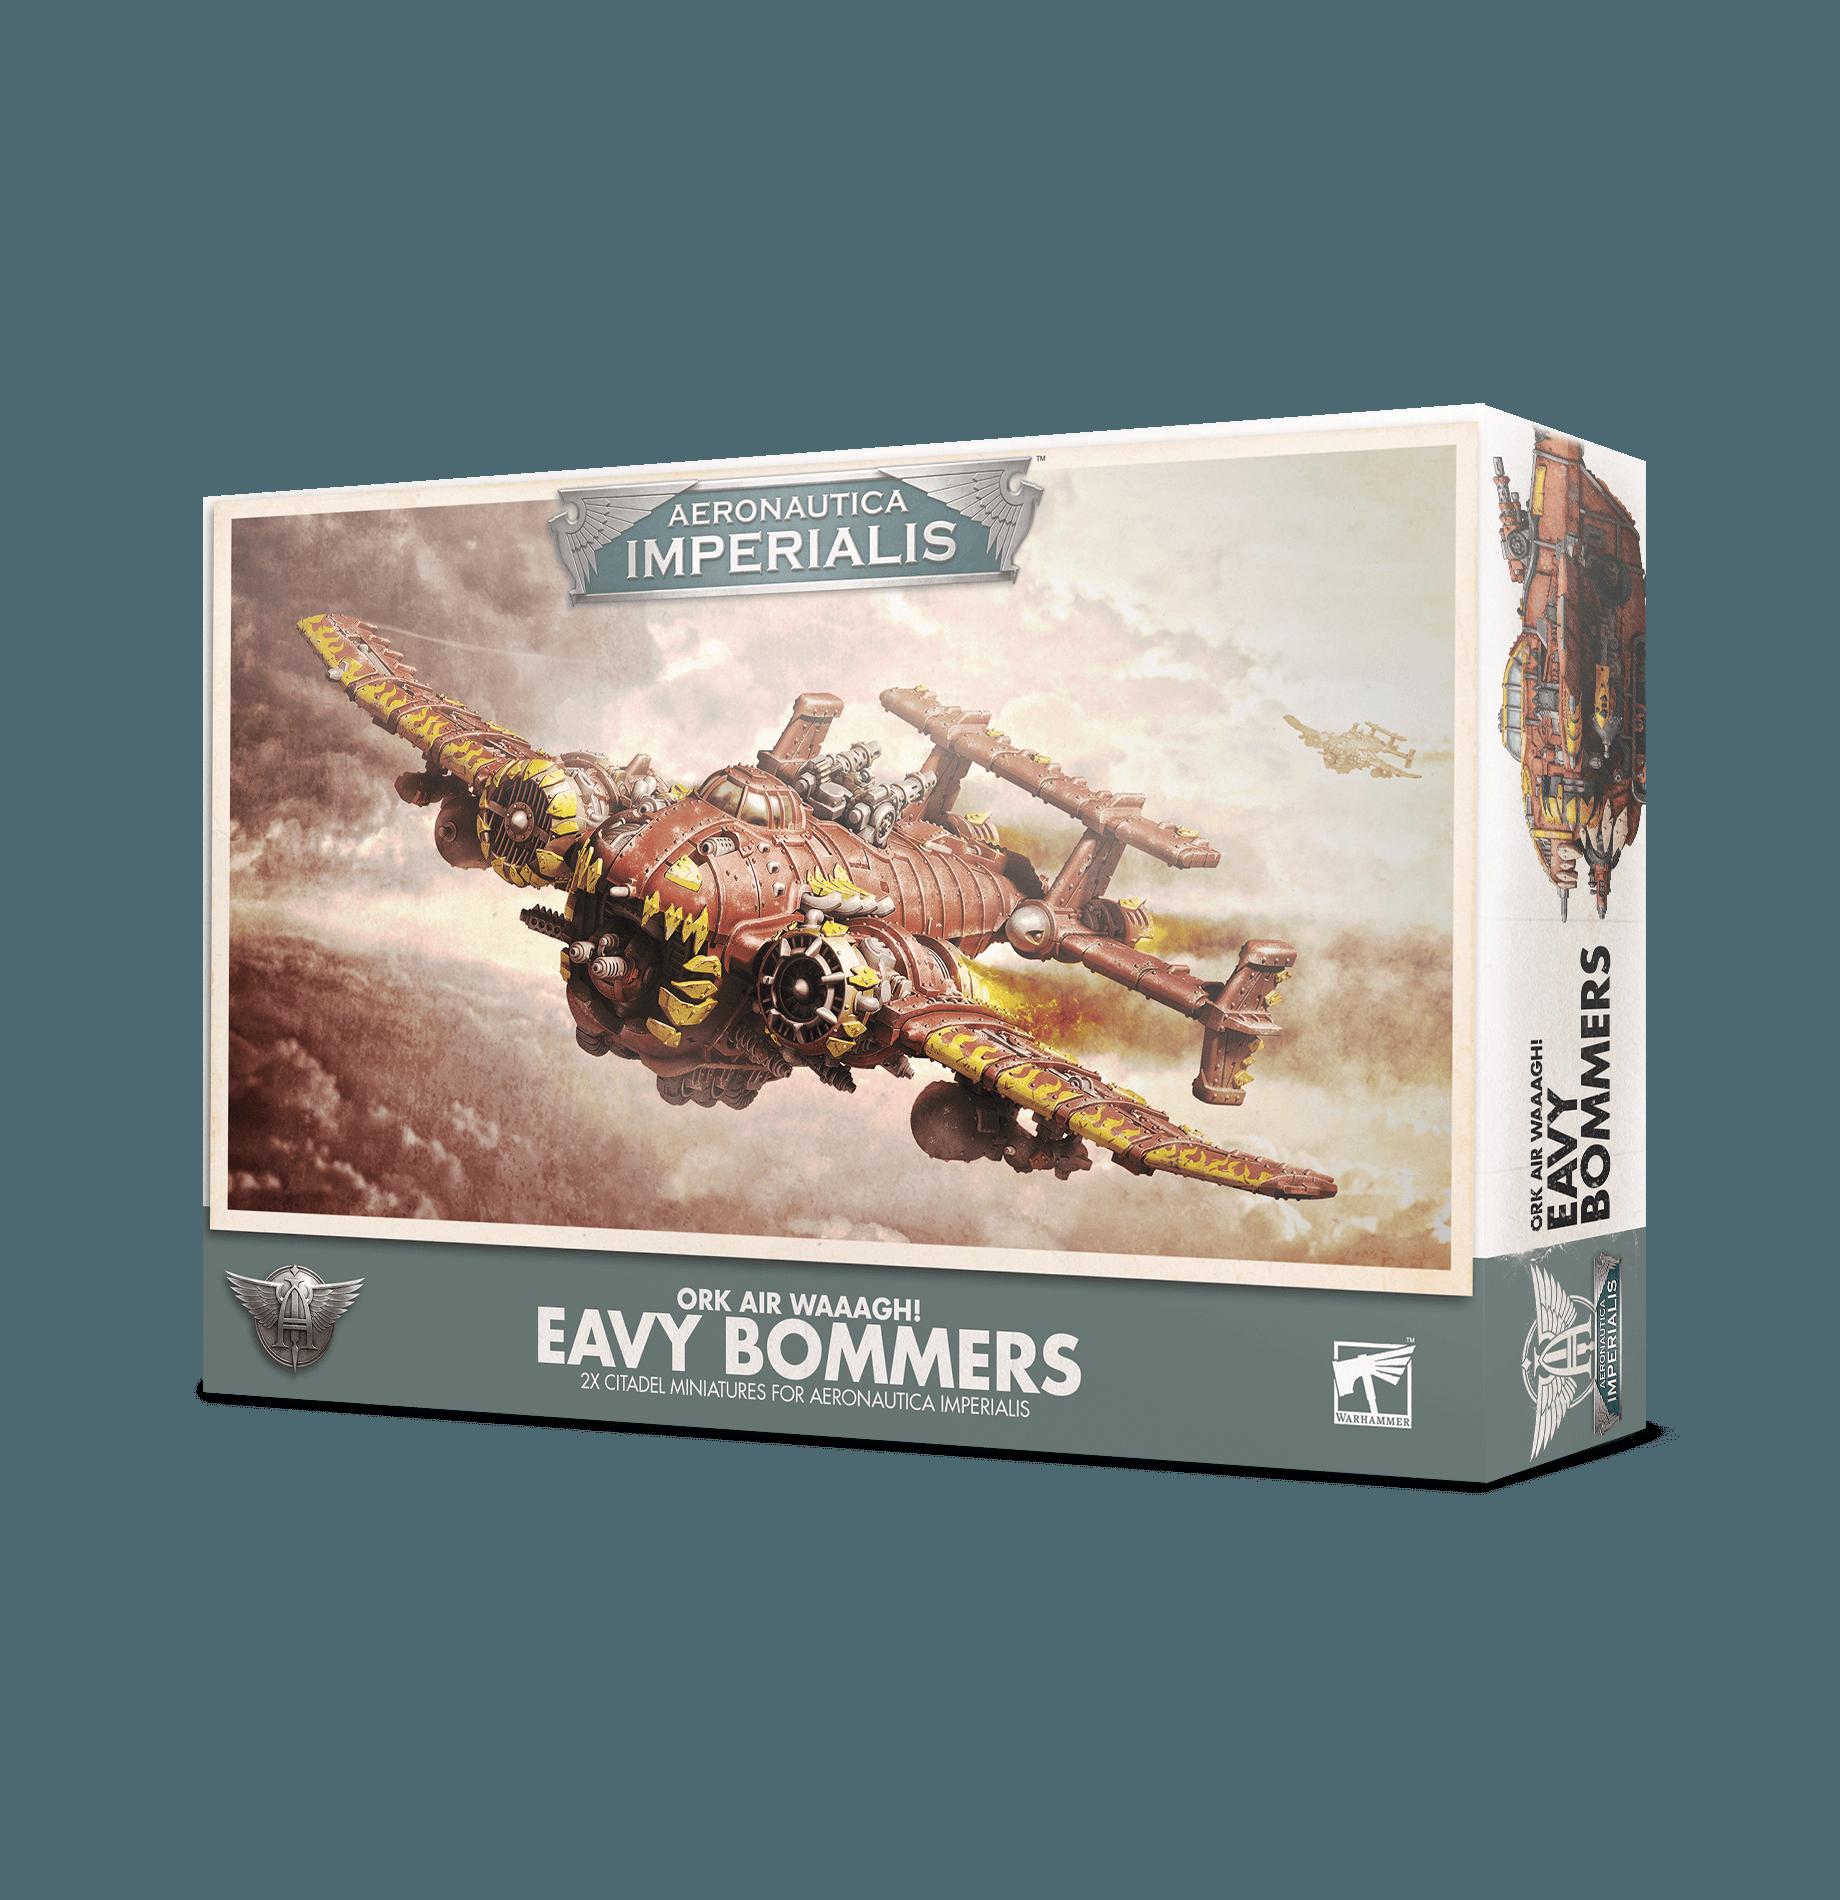 'Eavy Bommerz, Ork Air Waaagh! Aeronautica Imperialis